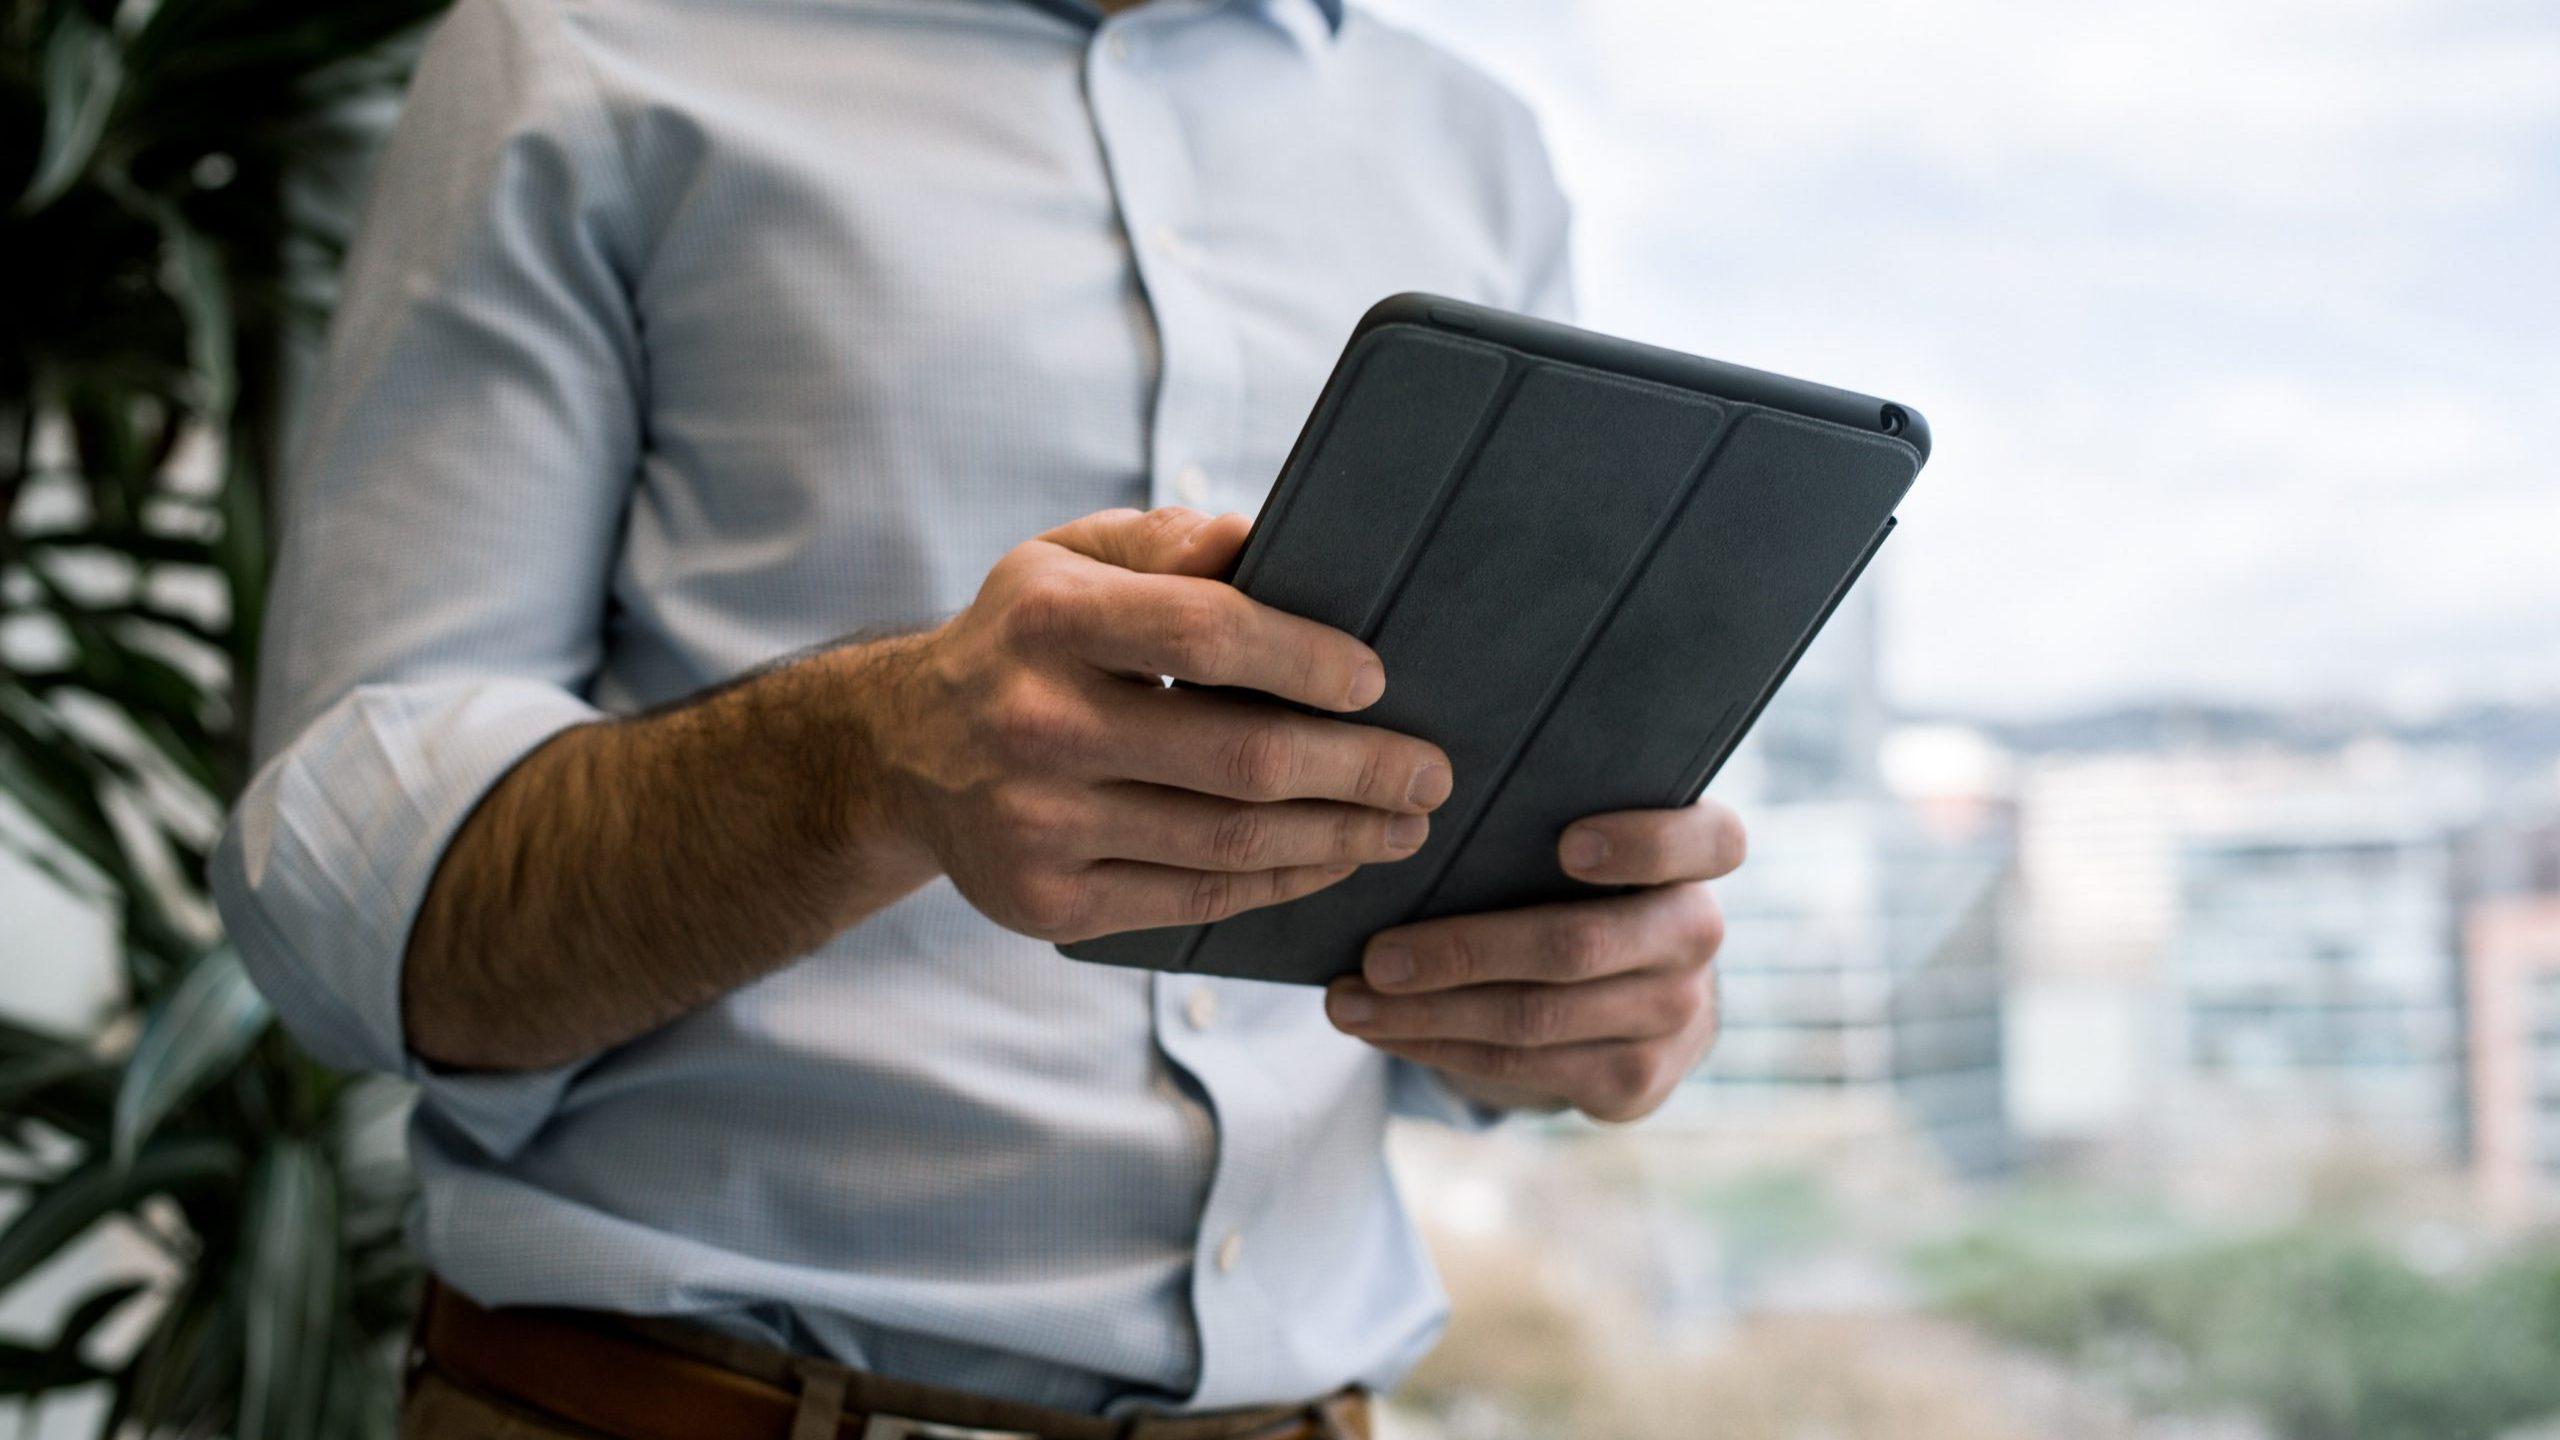 Ericsson's entry revitalizes WebPad scene